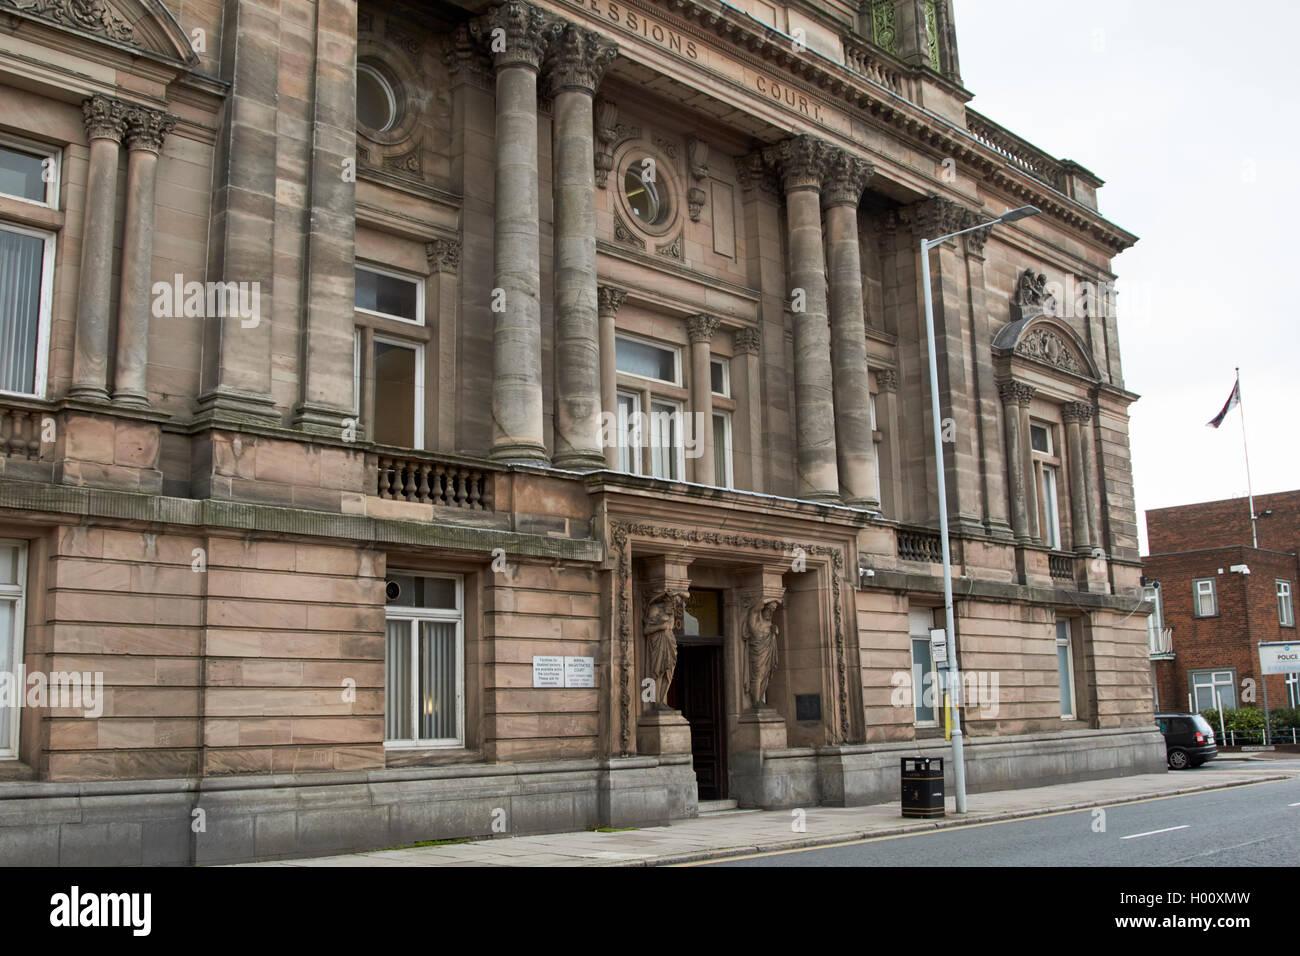 wirral magistrates court birkenhead Merseyside UK - Stock Image